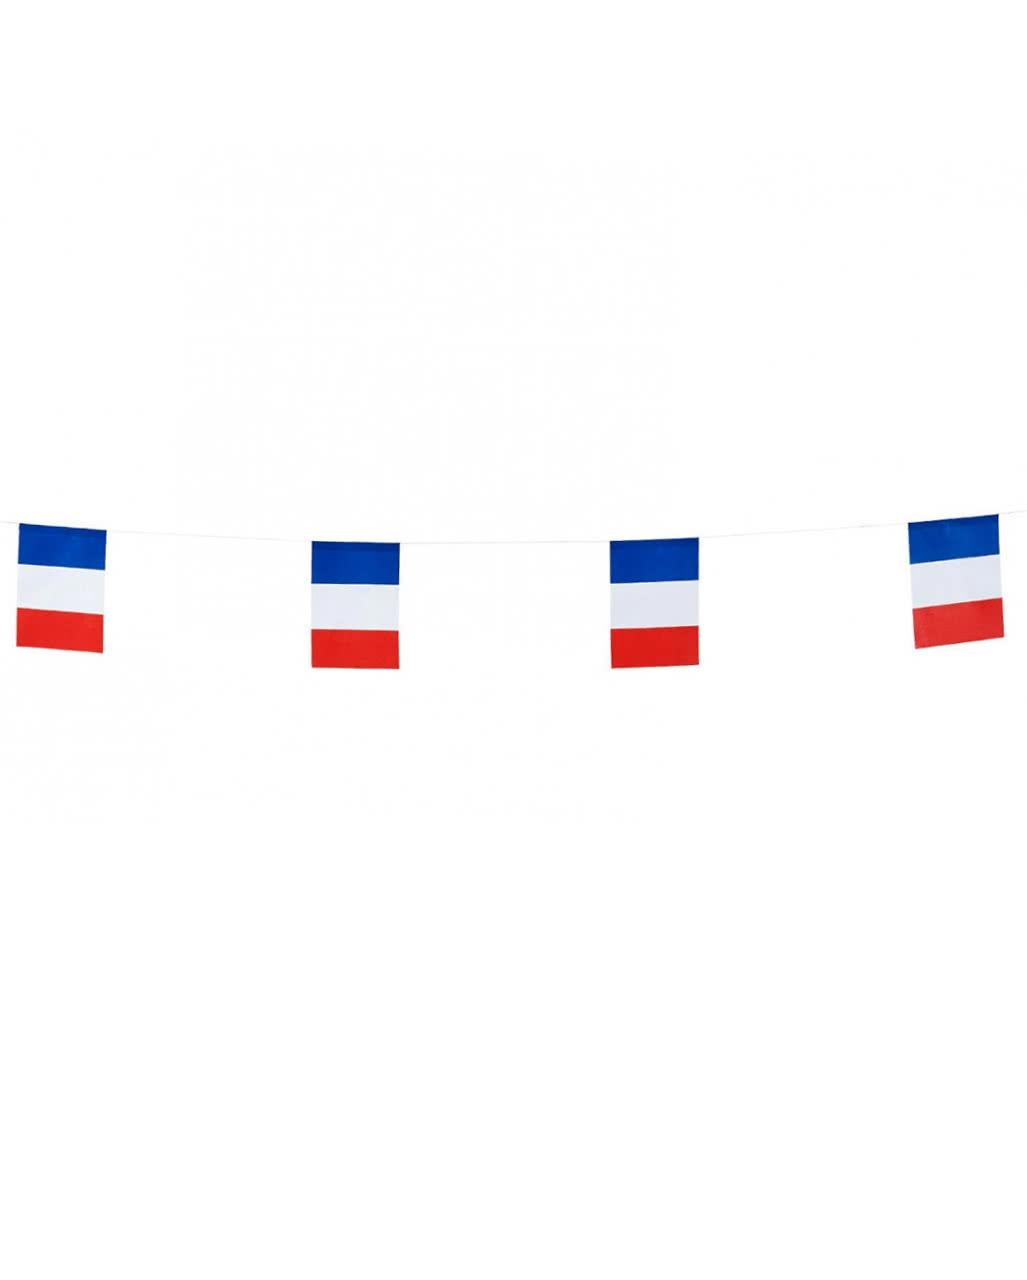 Fahnen girlande frankreich als h nge dekoration horror for Frankreich dekoration